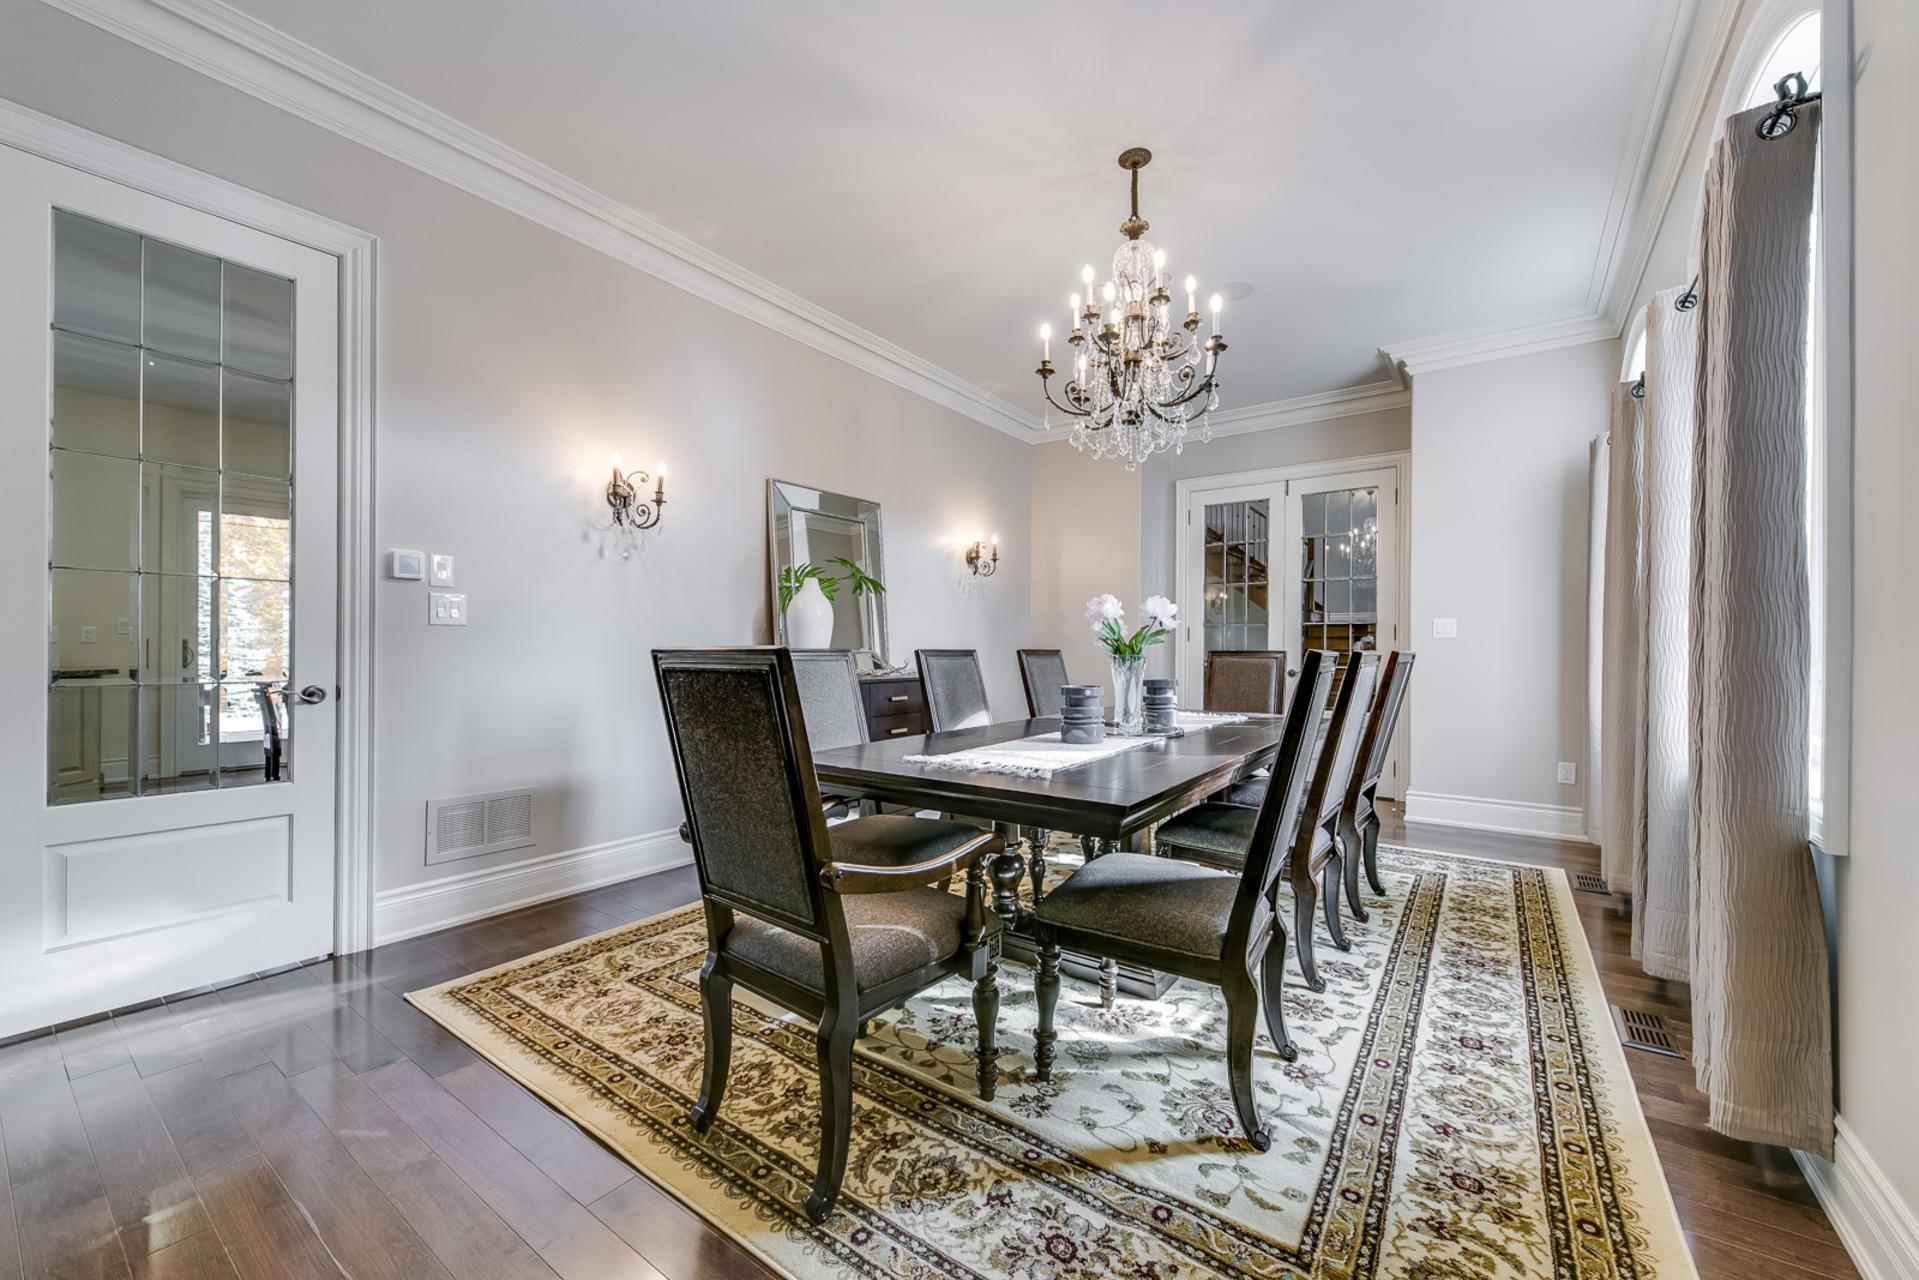 Dining Room - 5041 Lakeshore Rd, Burlington - Elite3 & Team at 5041 Lakeshore Road, Appleby, Burlington